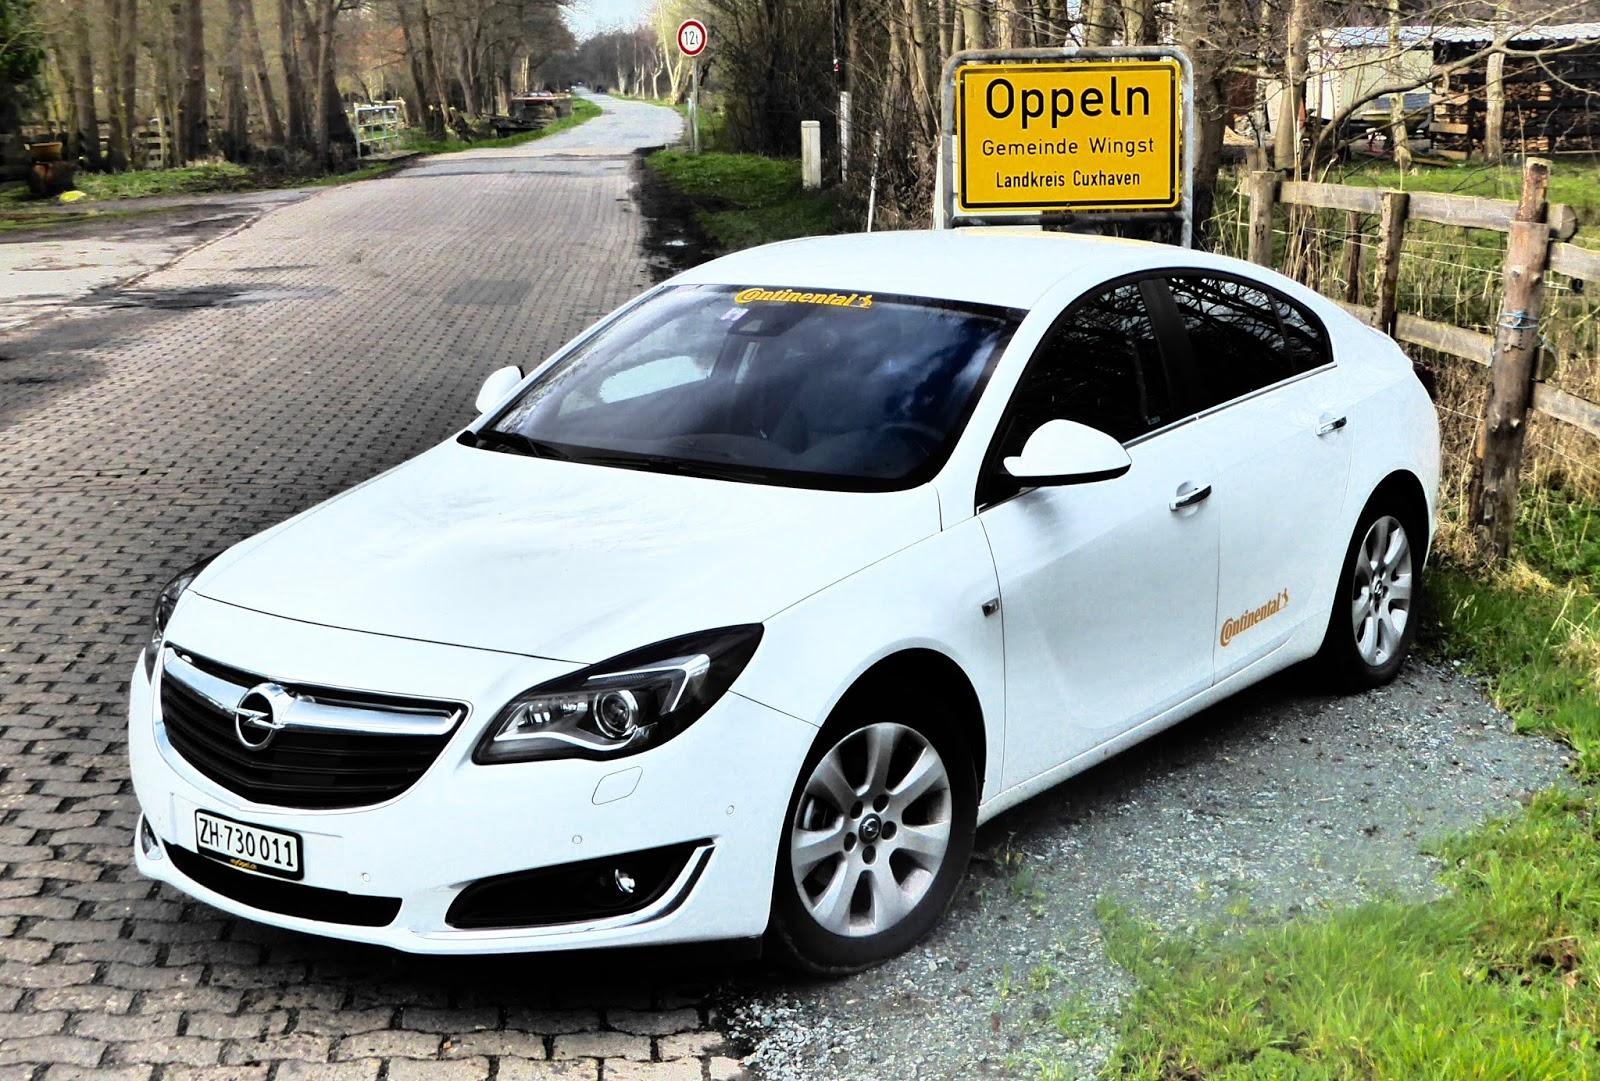 Opel Insignia 1 6 CDTi ecoFLEX Start top 300896 Το Opel Insignia 1.6 CDTI ecoFLEX έσπάσε το φράγμα των 2.000 km με ένα ρεζερβουάρ καυσίμου